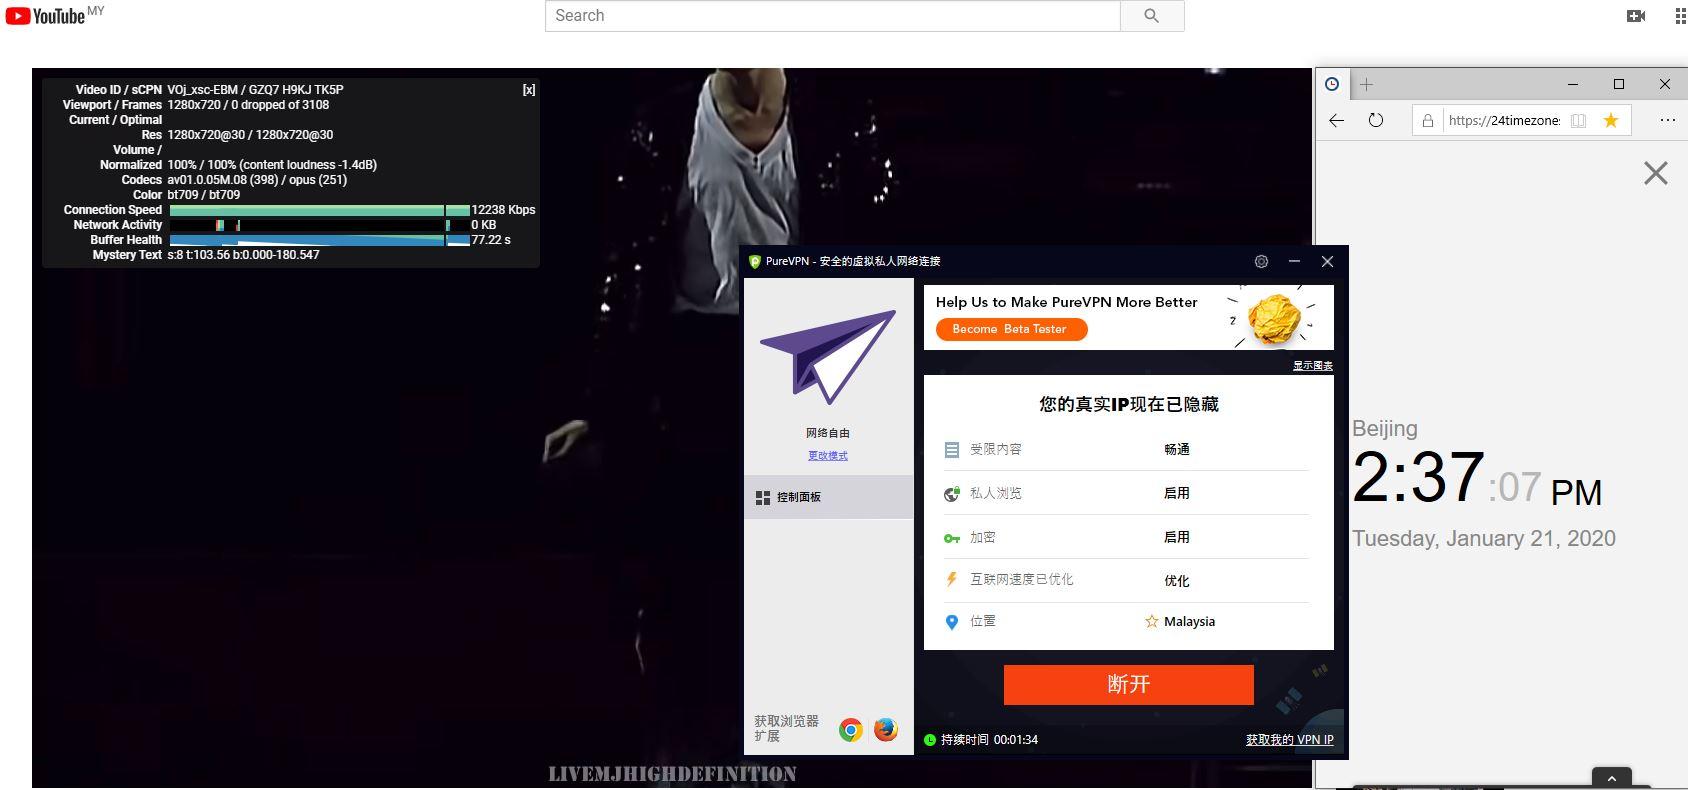 Windows10 StrongVPN Malaysia 中国VPN翻墙 科学上网 Youtube测速-20200121